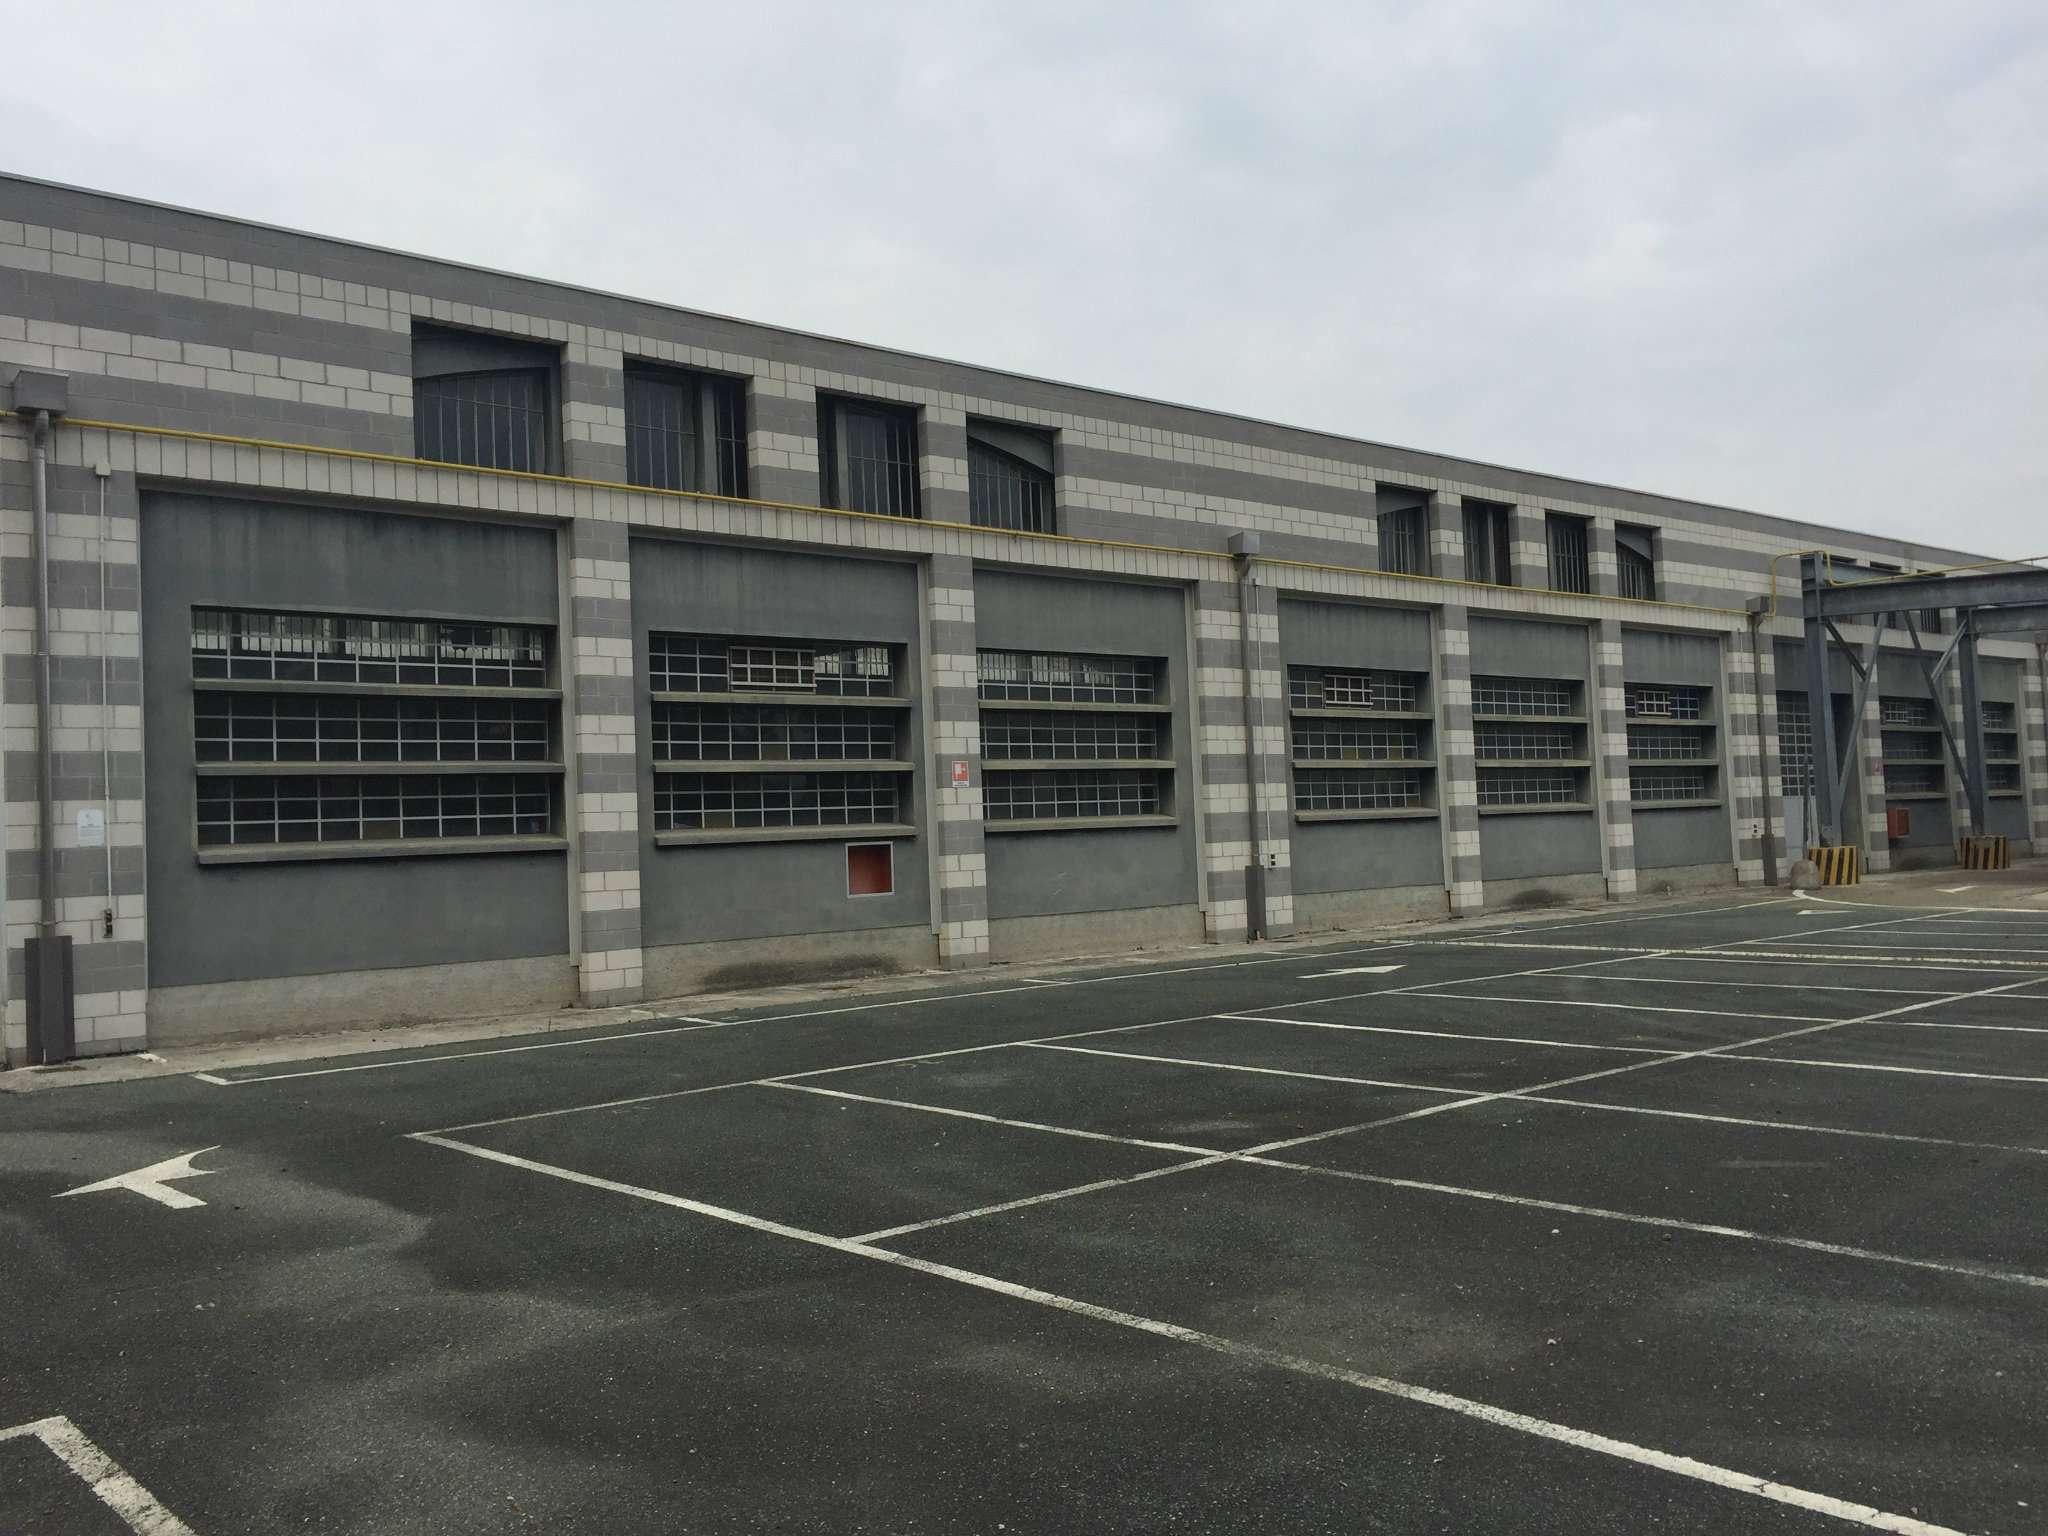 Capannone in vendita a Novi Ligure, 9999 locali, Trattative riservate | PortaleAgenzieImmobiliari.it